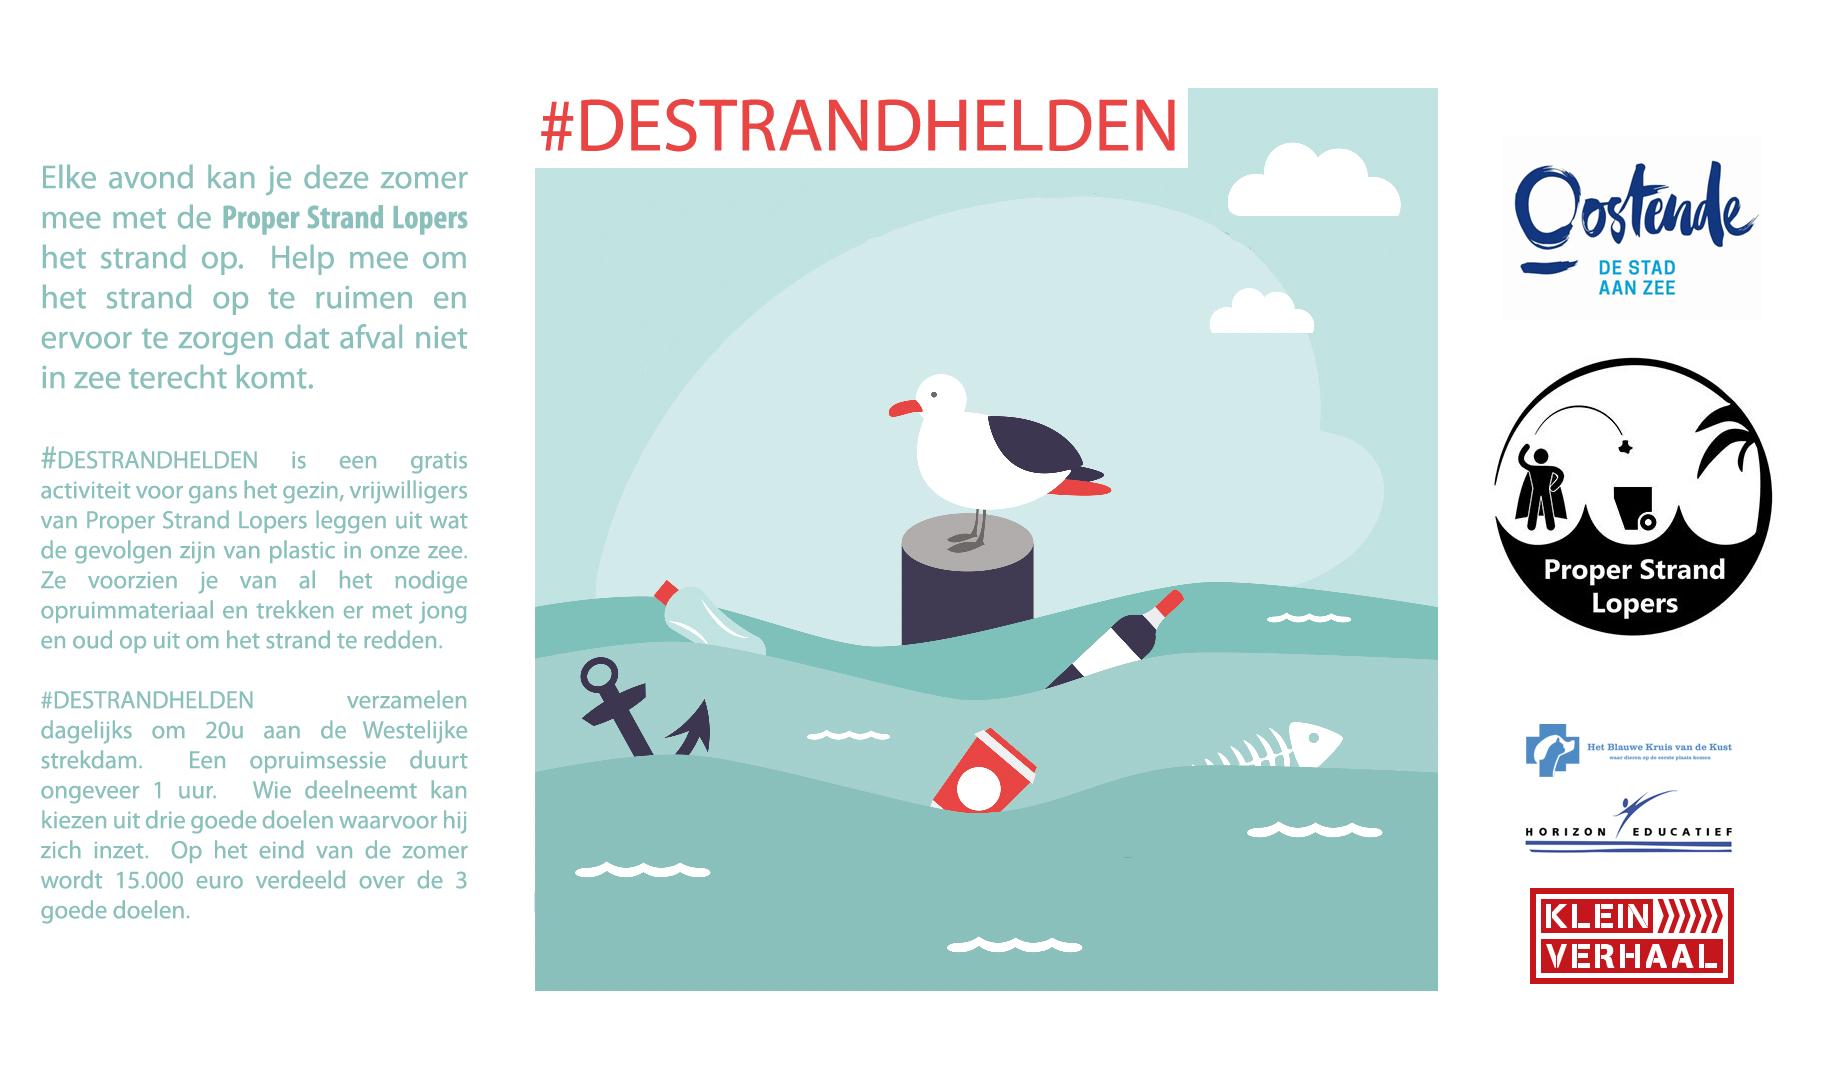 #DESTRANDHELDEN